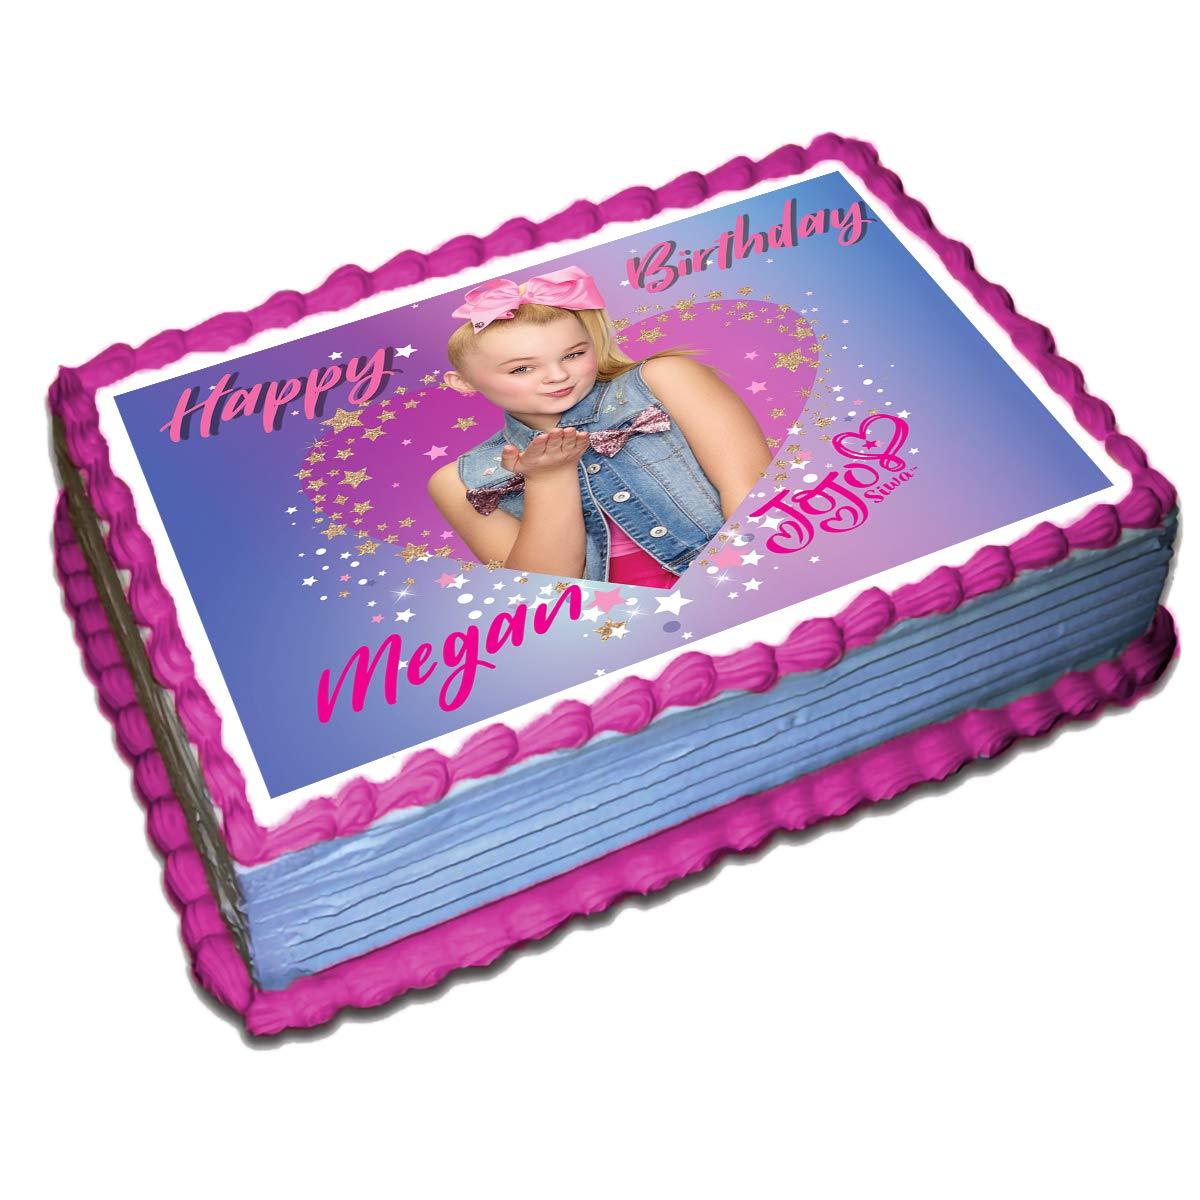 Jojo Siwa Personalized Cake Toppers Icing Sugar Paper 8.5 x 11.5 ...